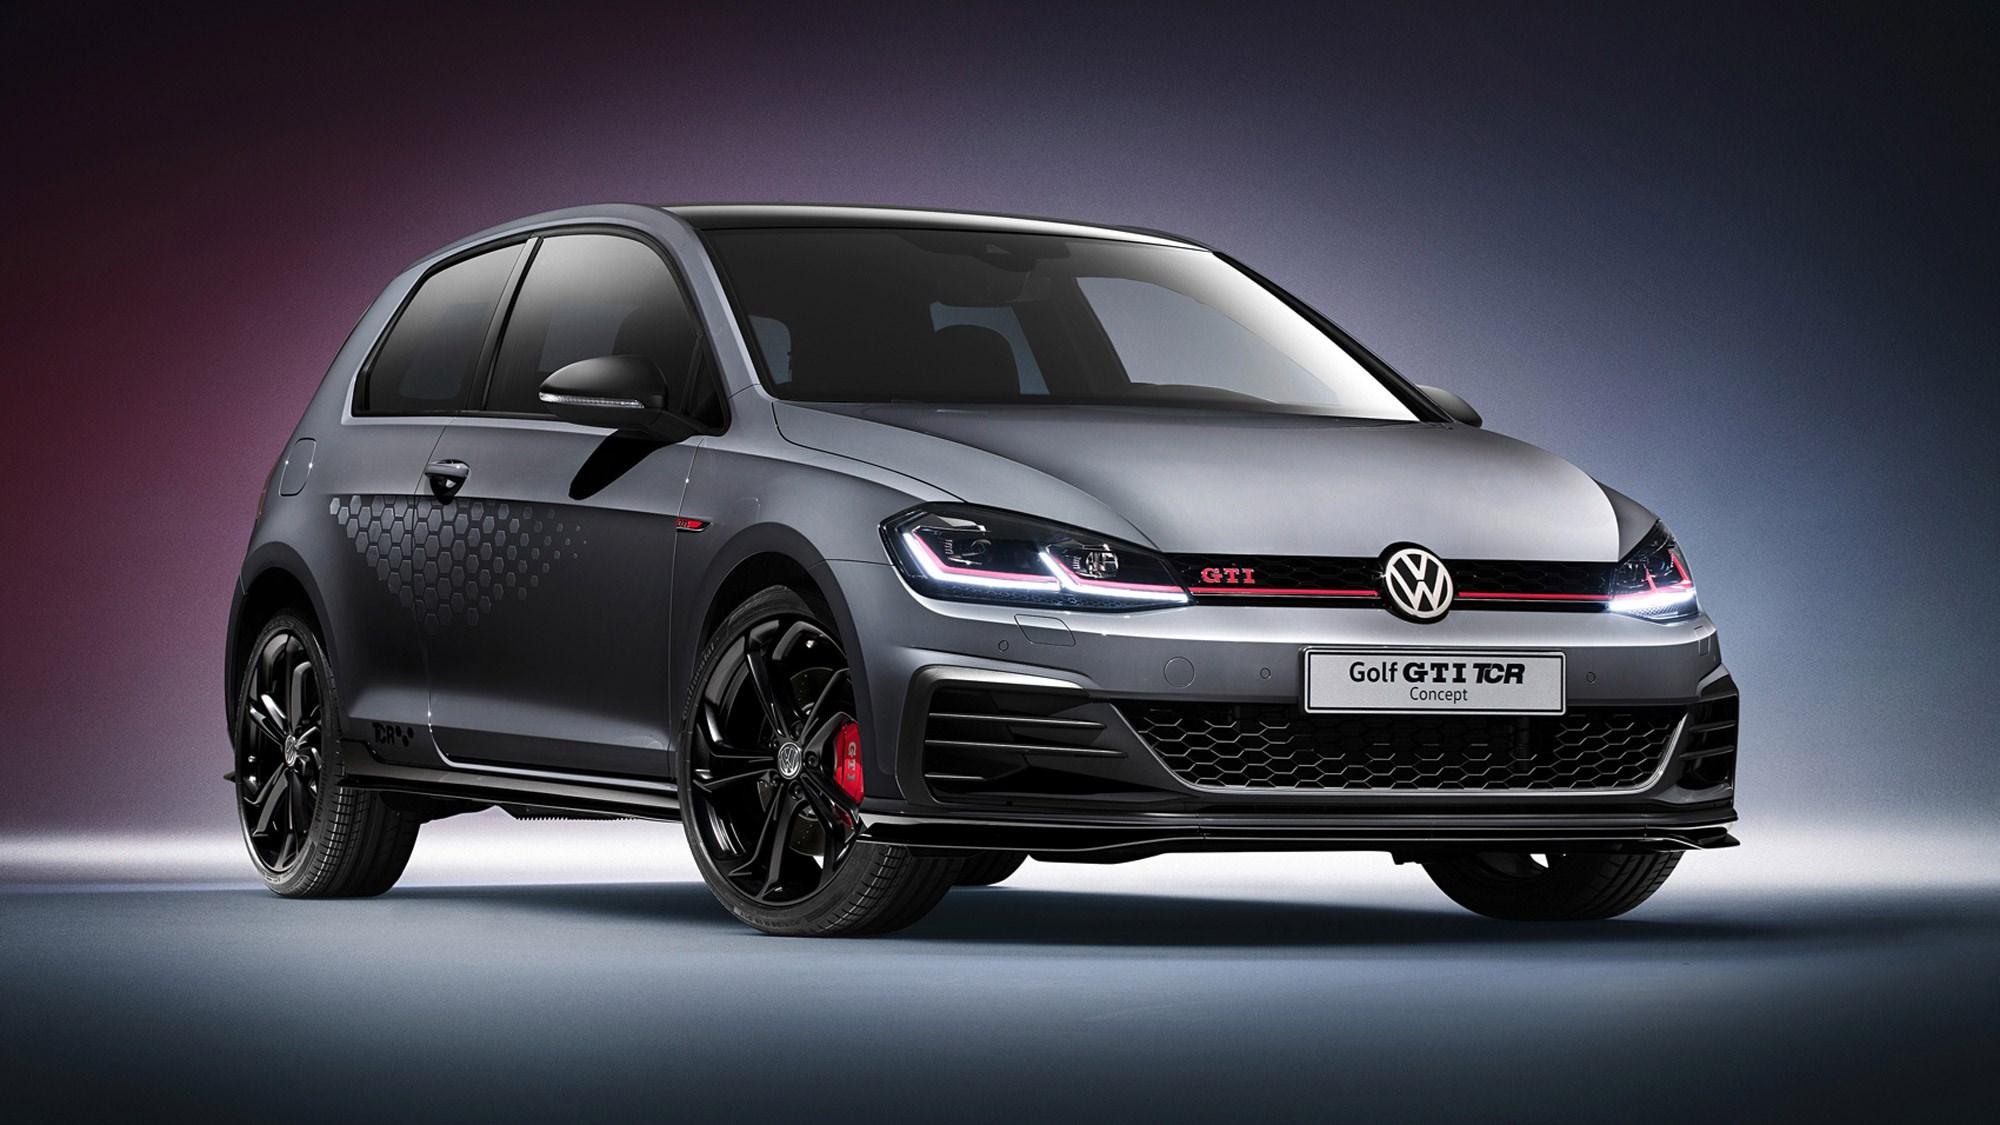 vw golf gti tcr fastest road legal golf gets official car magazine. Black Bedroom Furniture Sets. Home Design Ideas